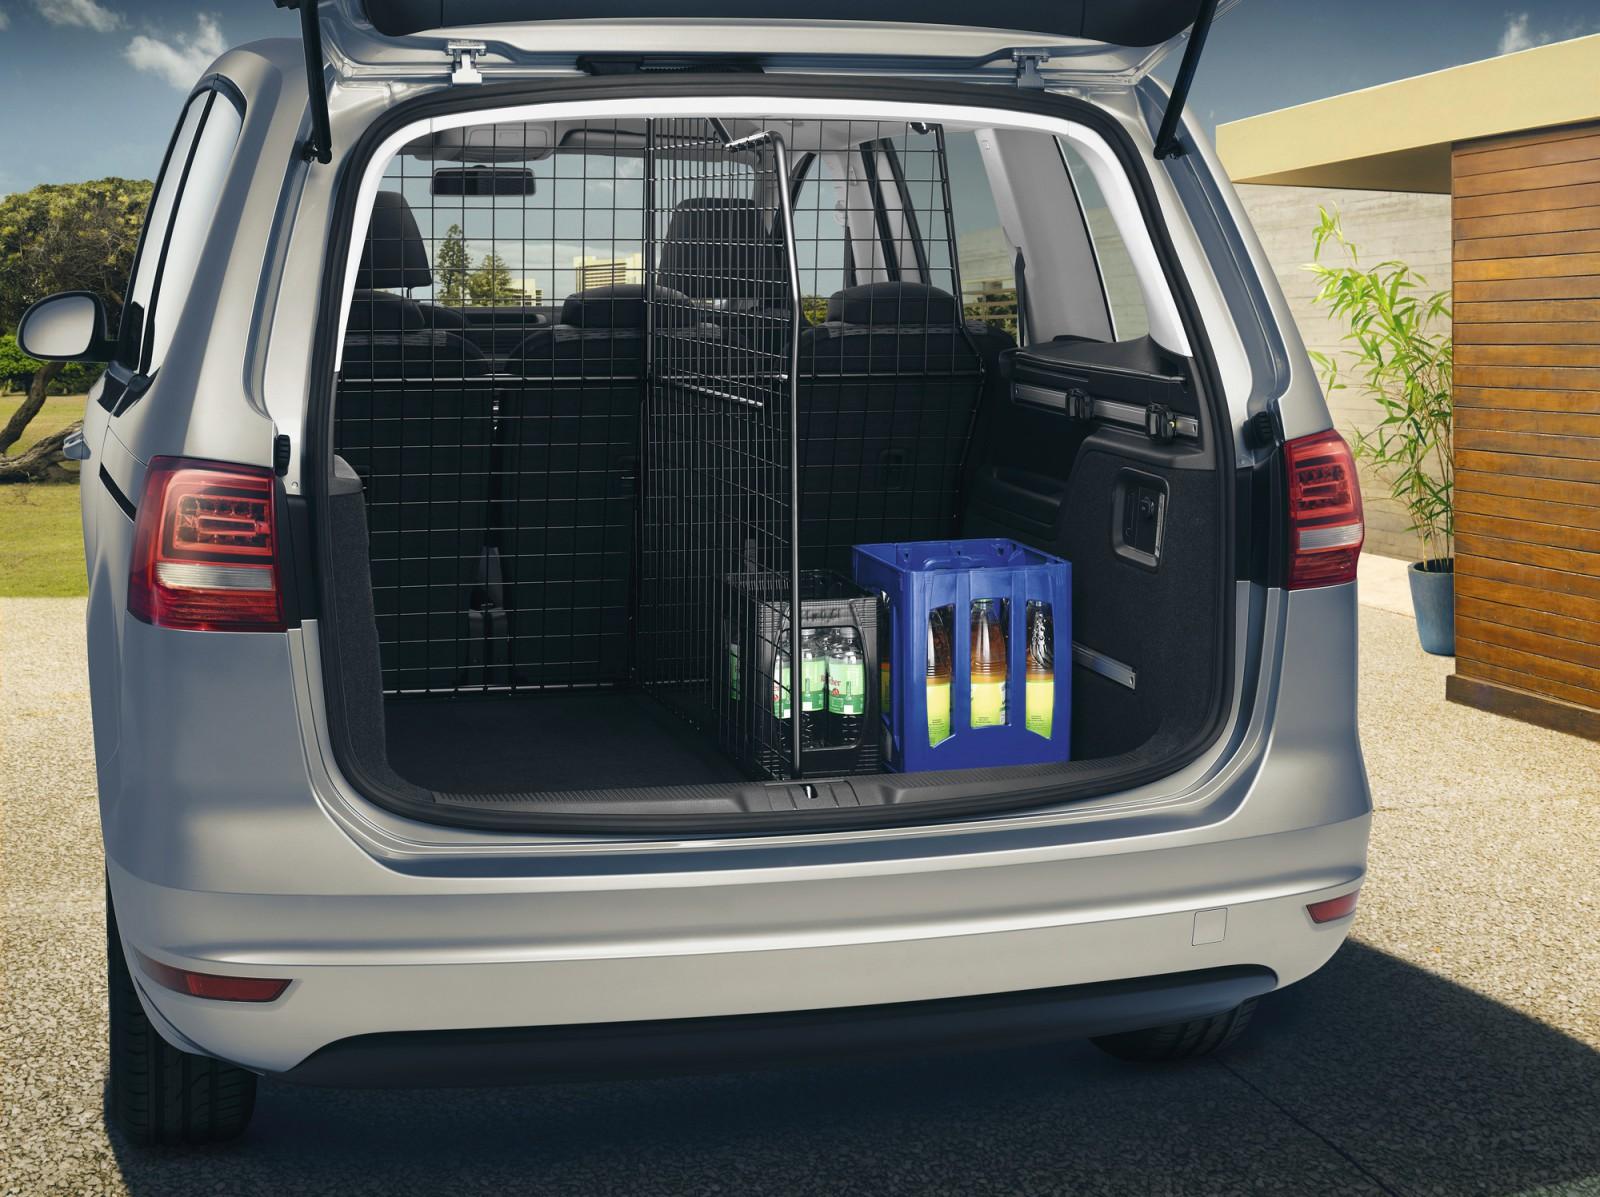 trenngitter kofferraum vw sharan original volkswagen. Black Bedroom Furniture Sets. Home Design Ideas